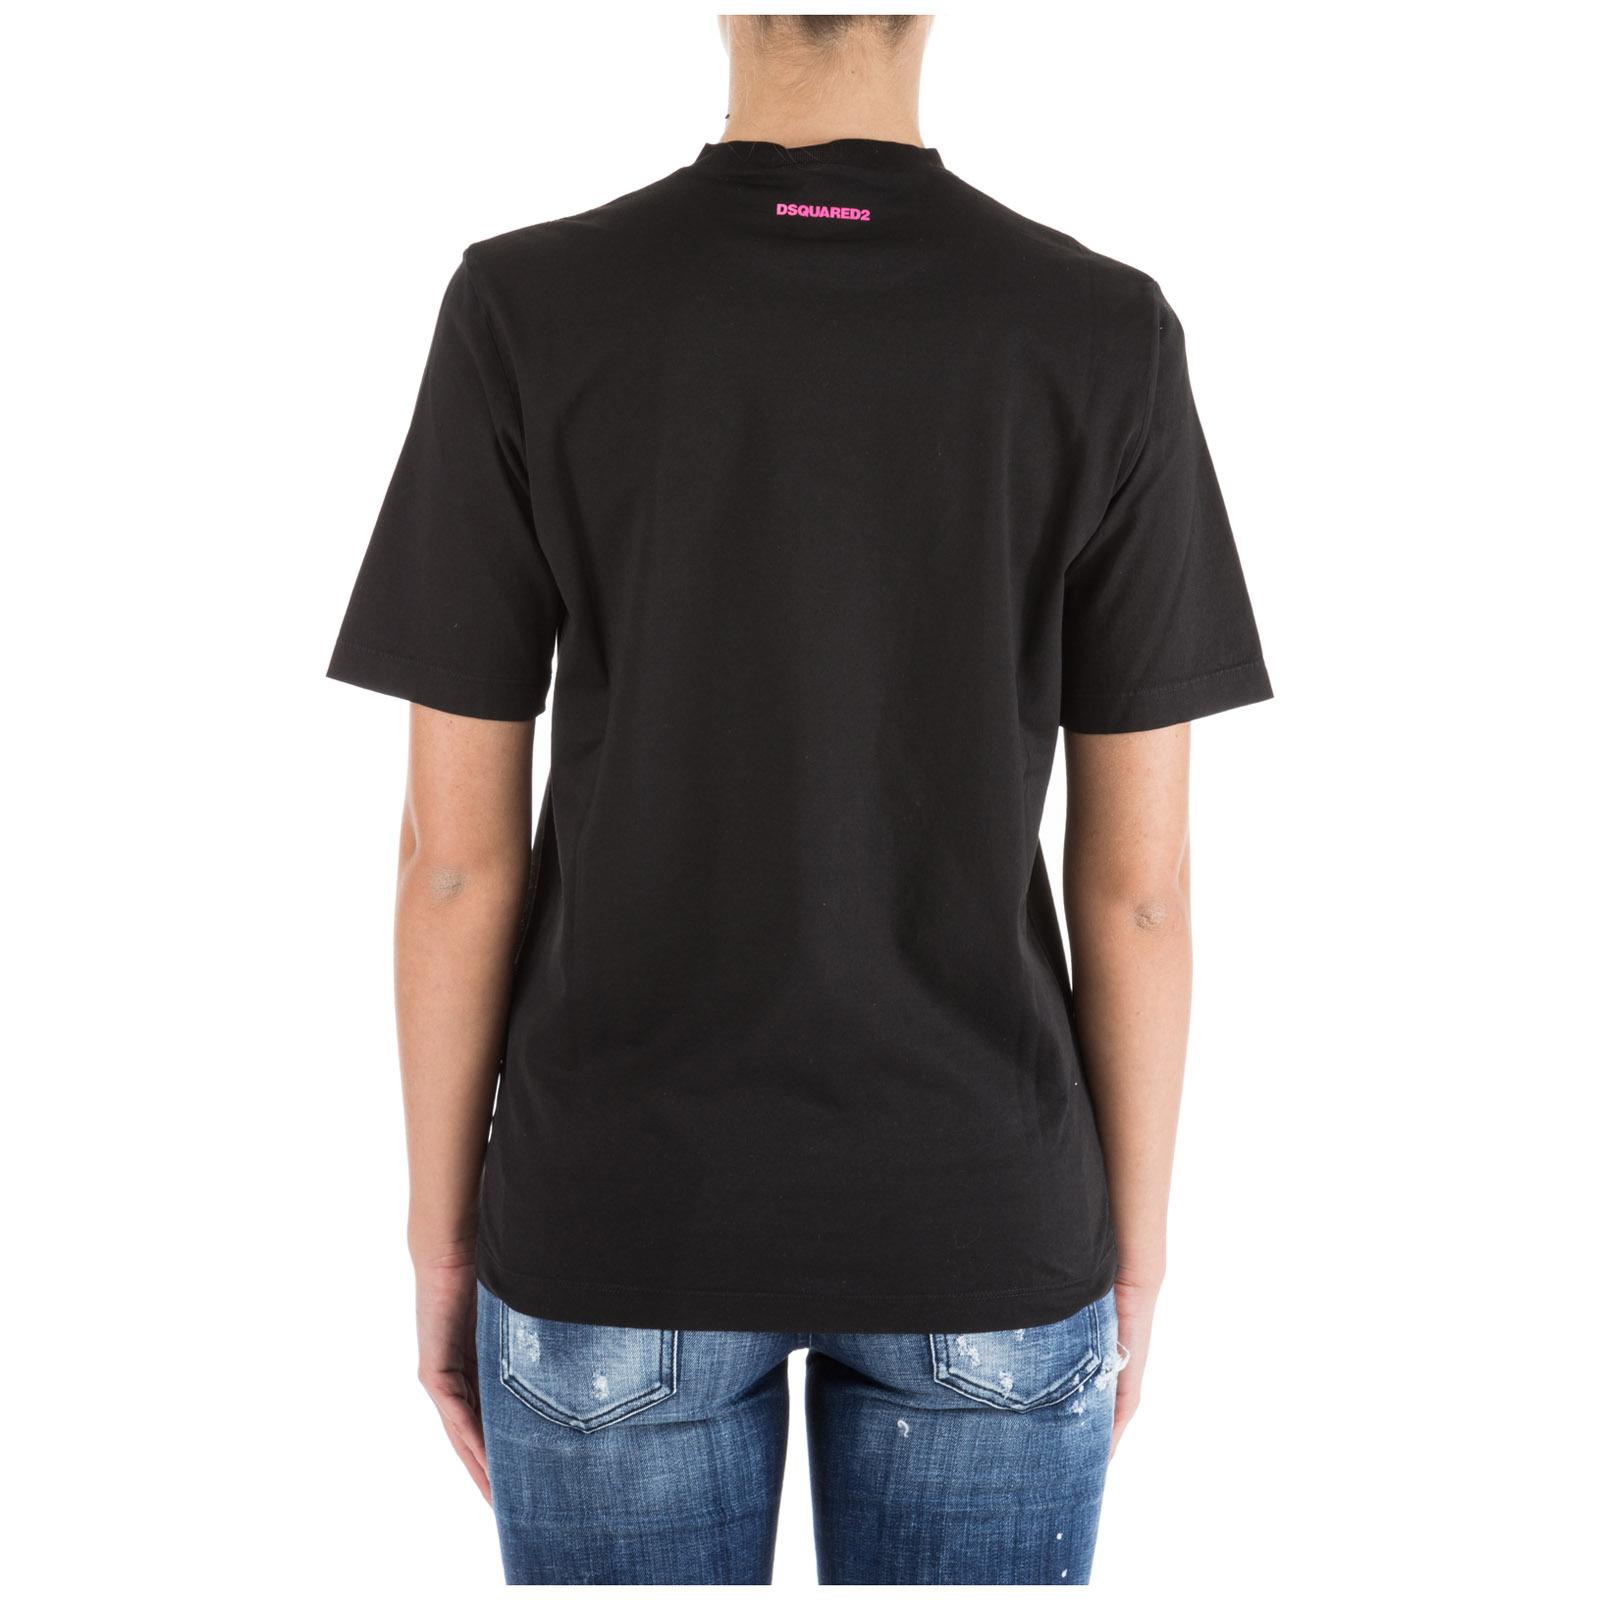 Women's t-shirt short sleeve crew neck round icon